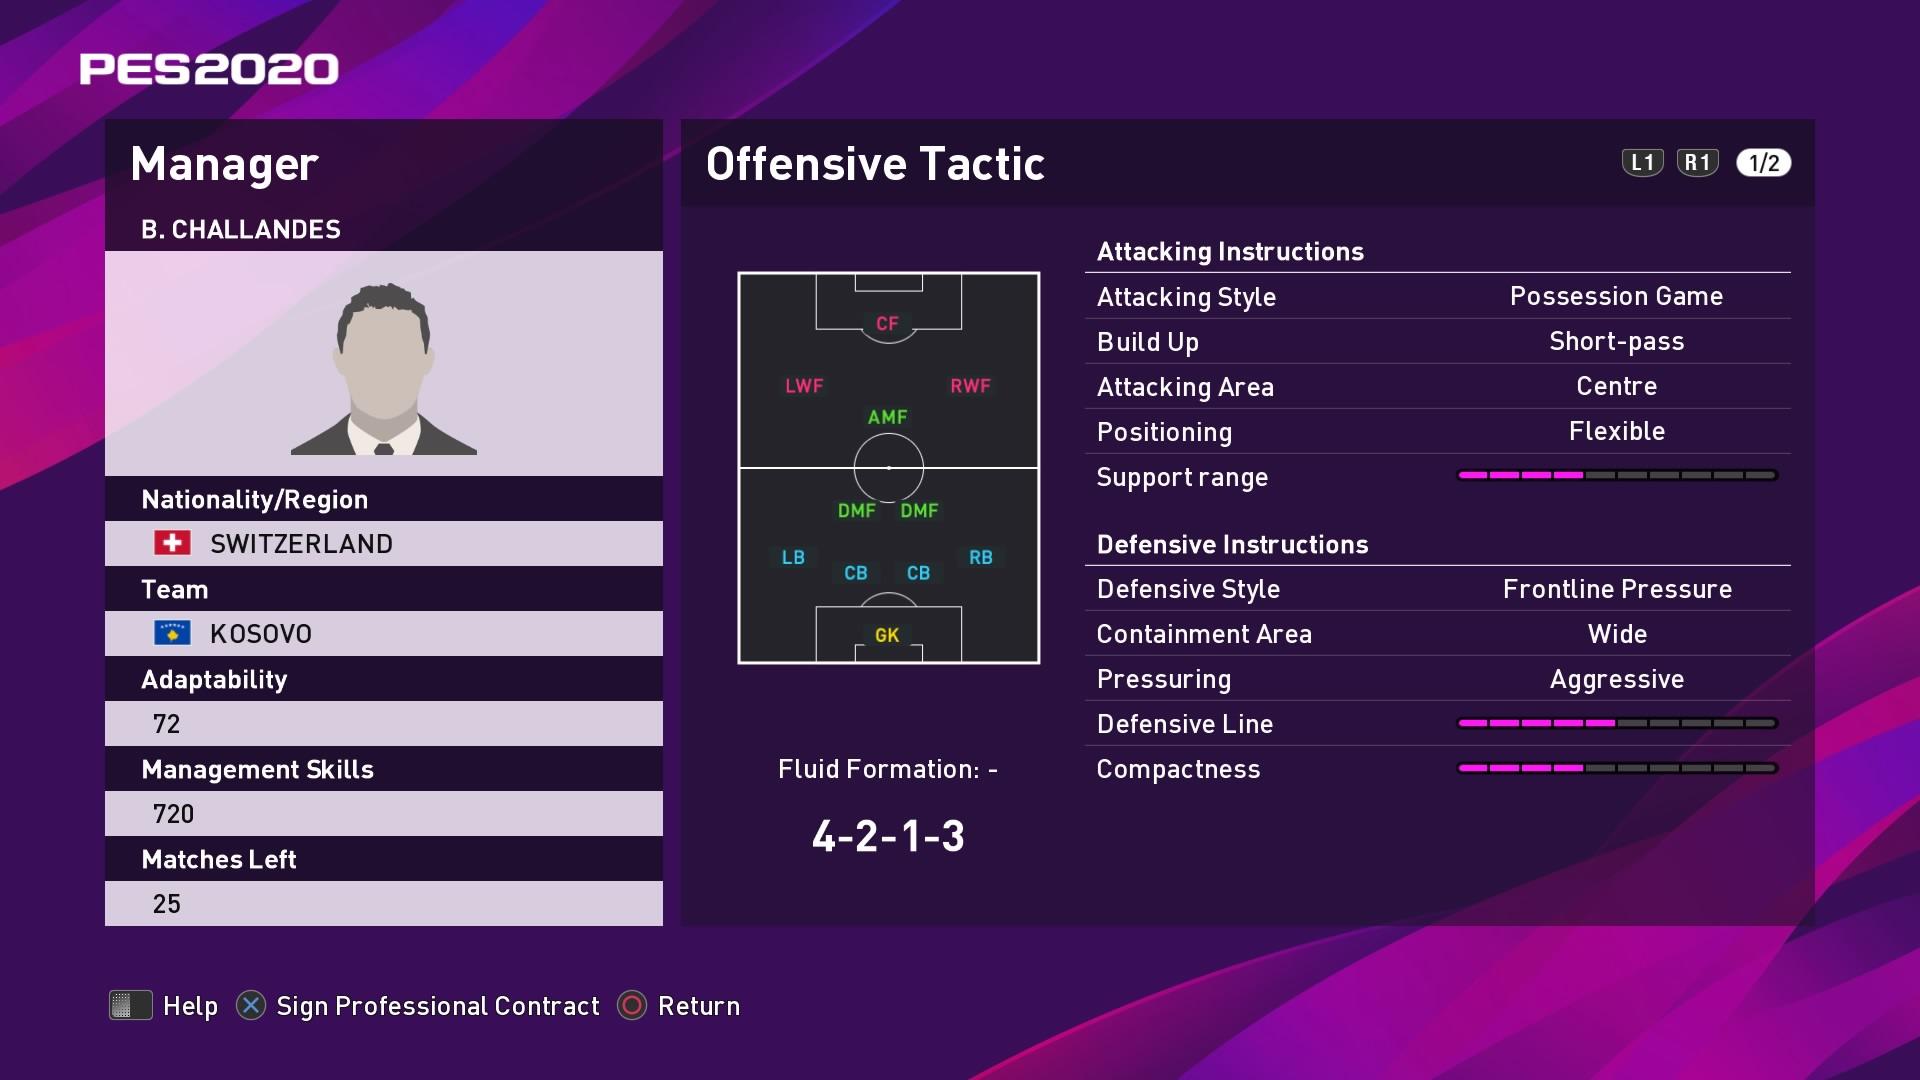 B. Challandes (Bernard Challandes) Offensive Tactic in PES 2020 myClub